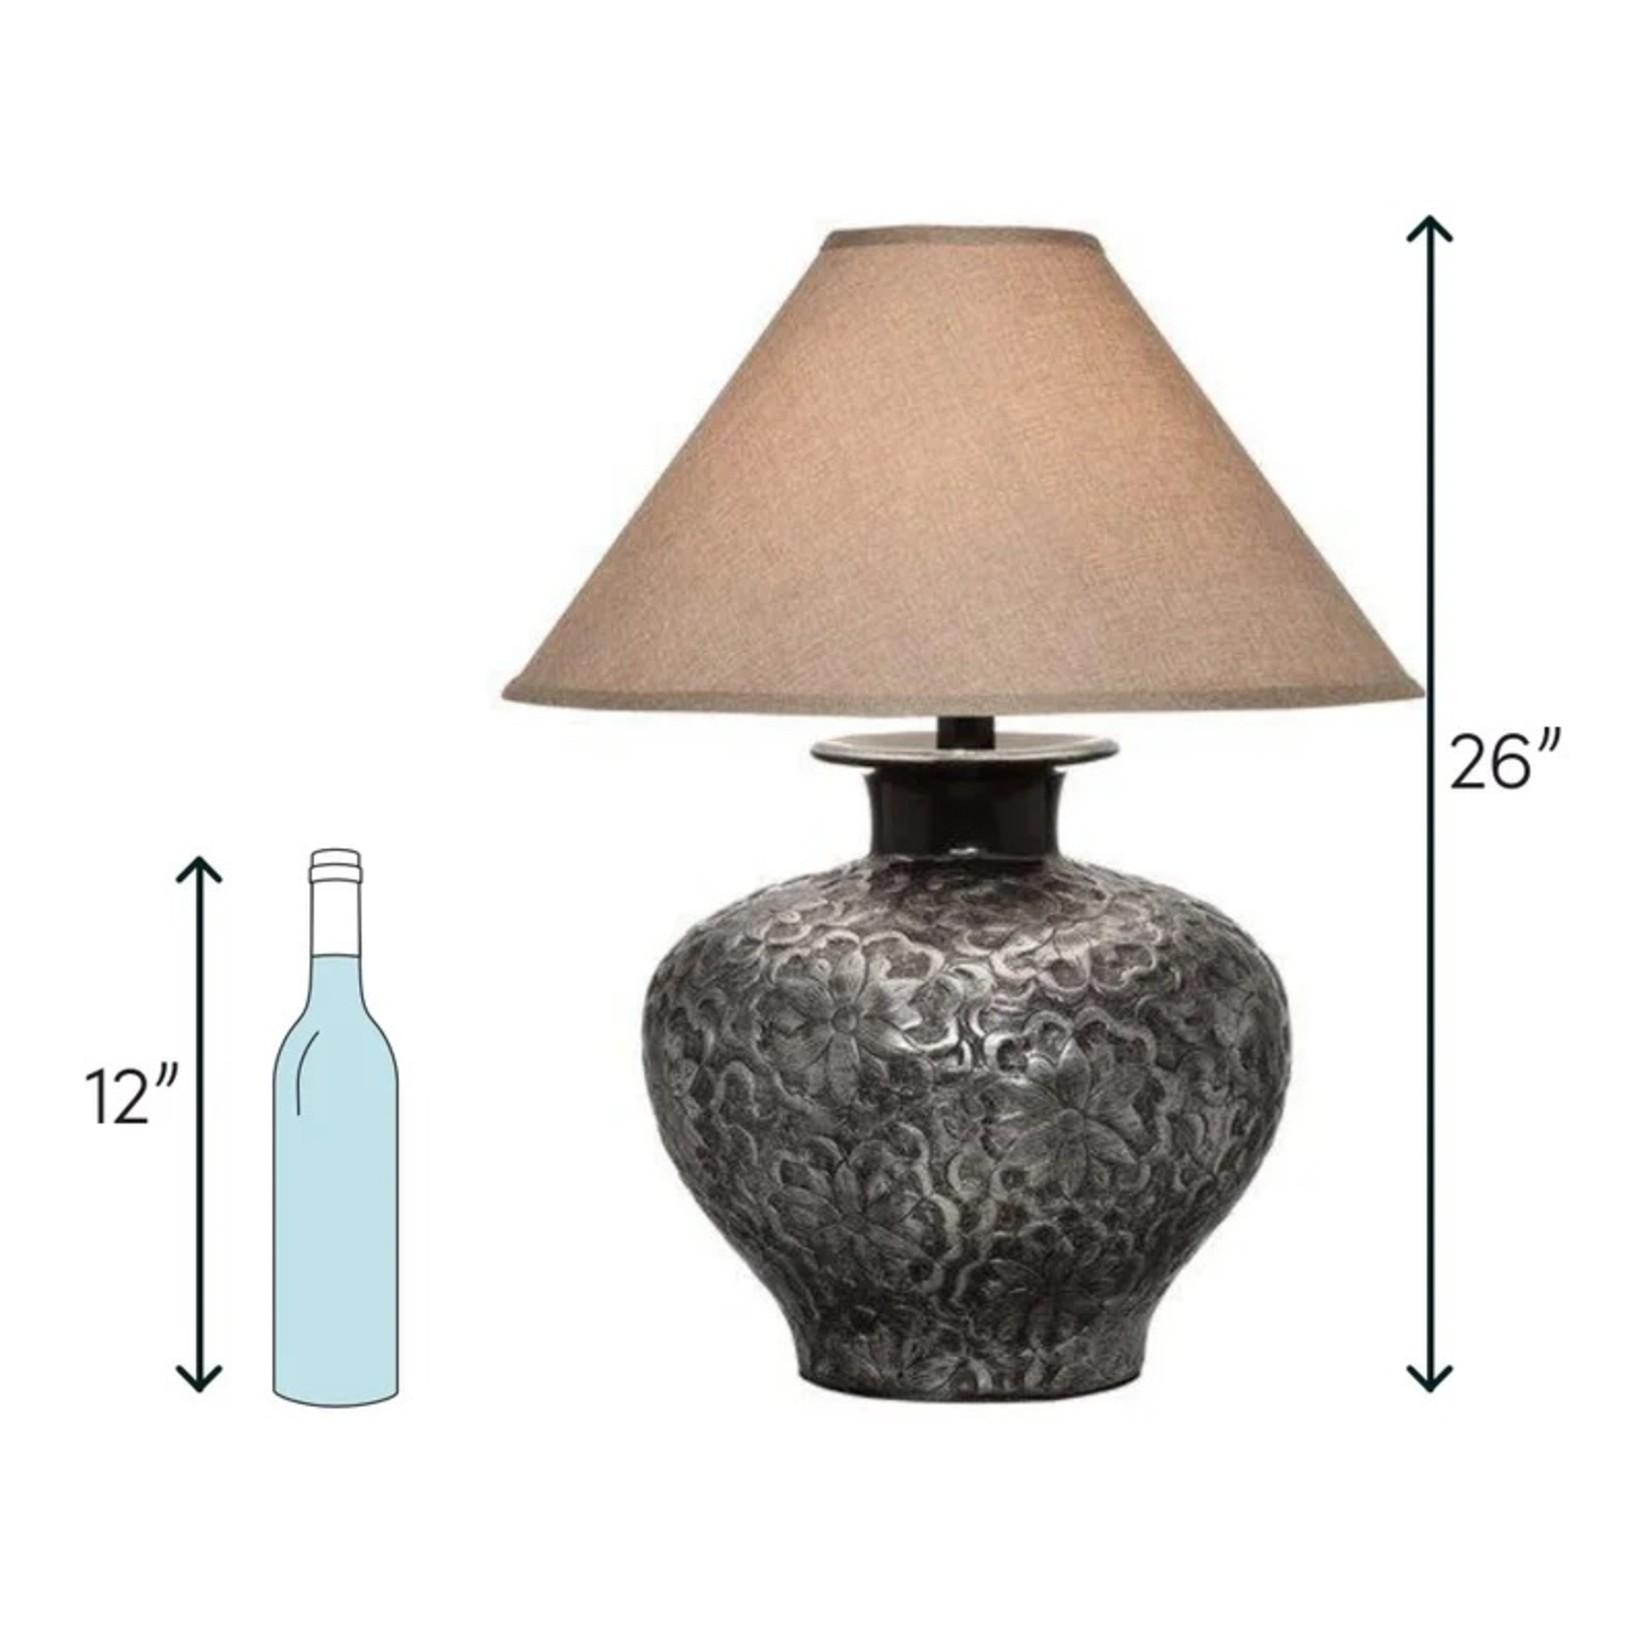 "*Bolan 26"" Table Lamp"